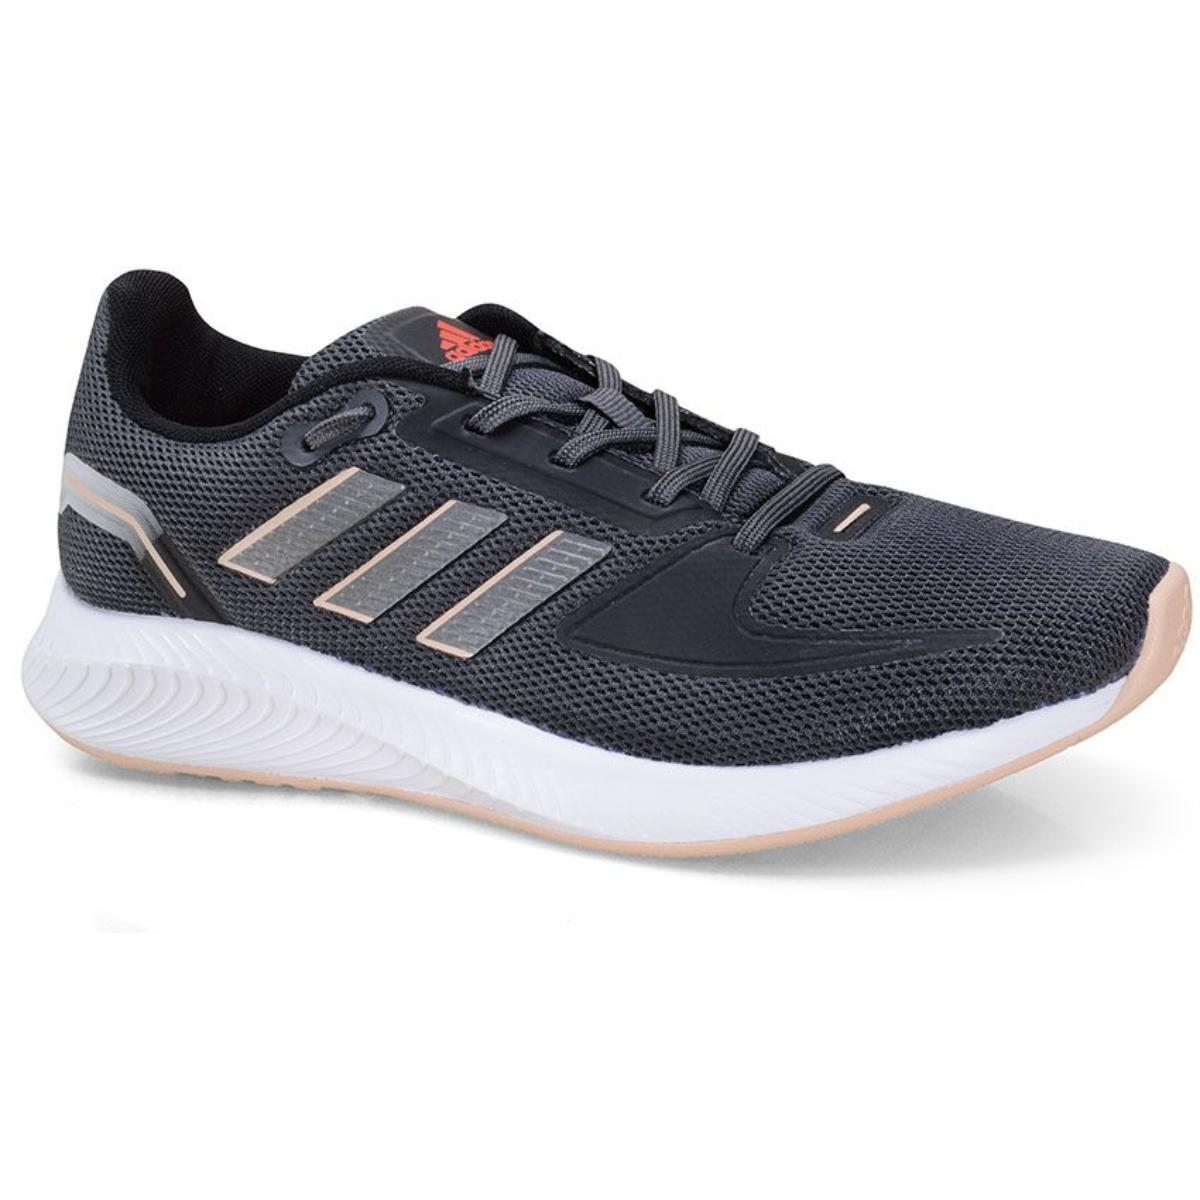 Tênis Feminino Adidas H04519 Runfalcon 2.0 Grafite